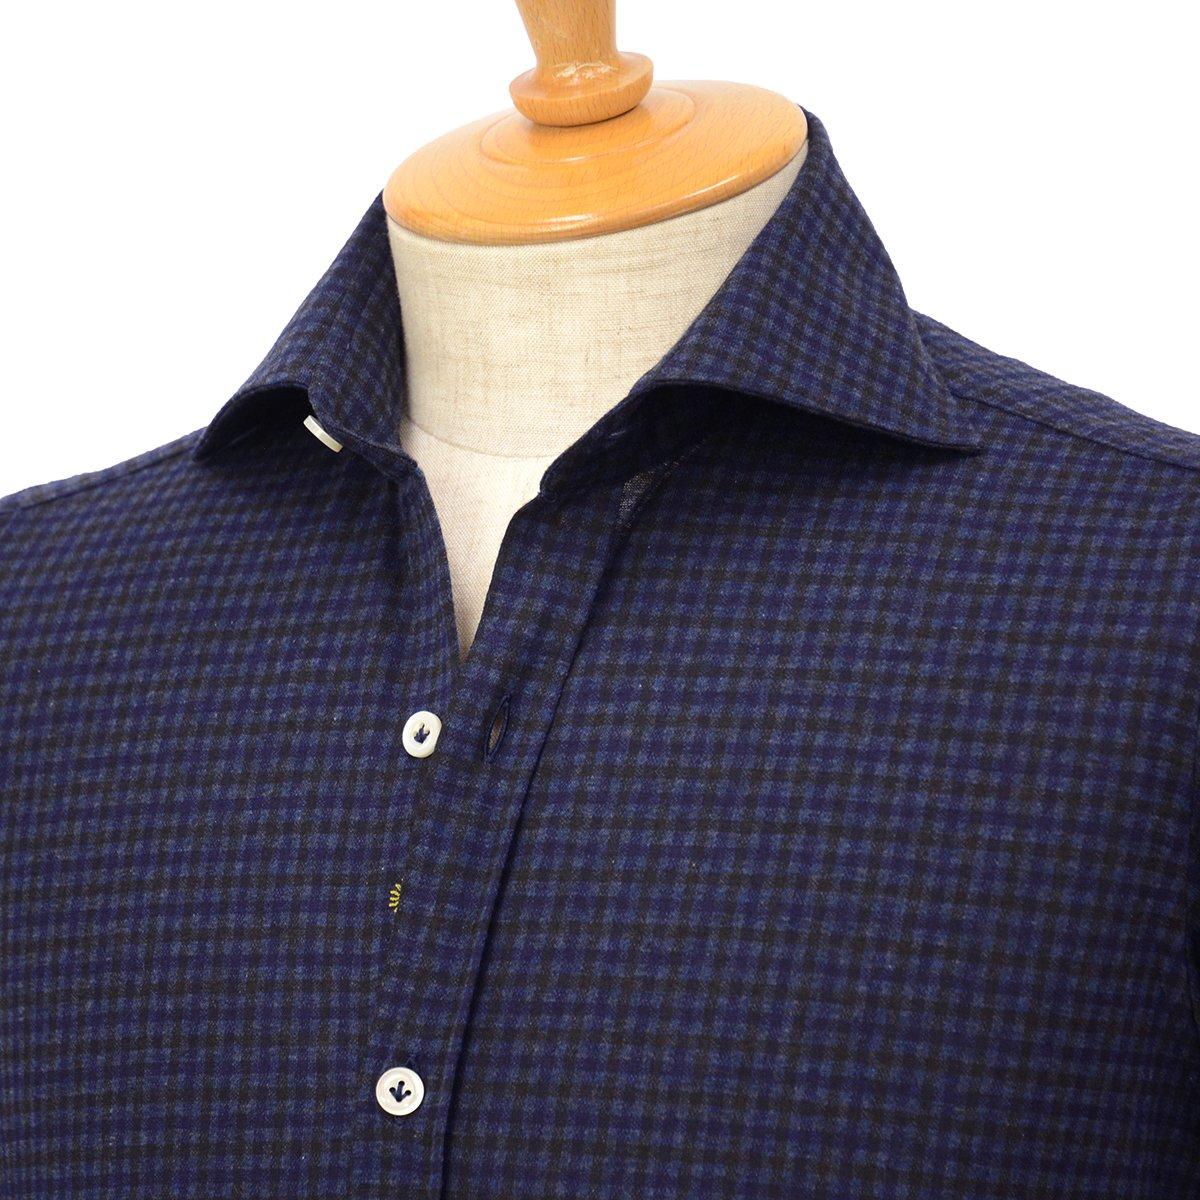 【30%OFF】【size36】Giannetto【ジャンネット】ジャージーチェックシャツ VINCIFIT 92031186370V81 005 コットン ネイビー